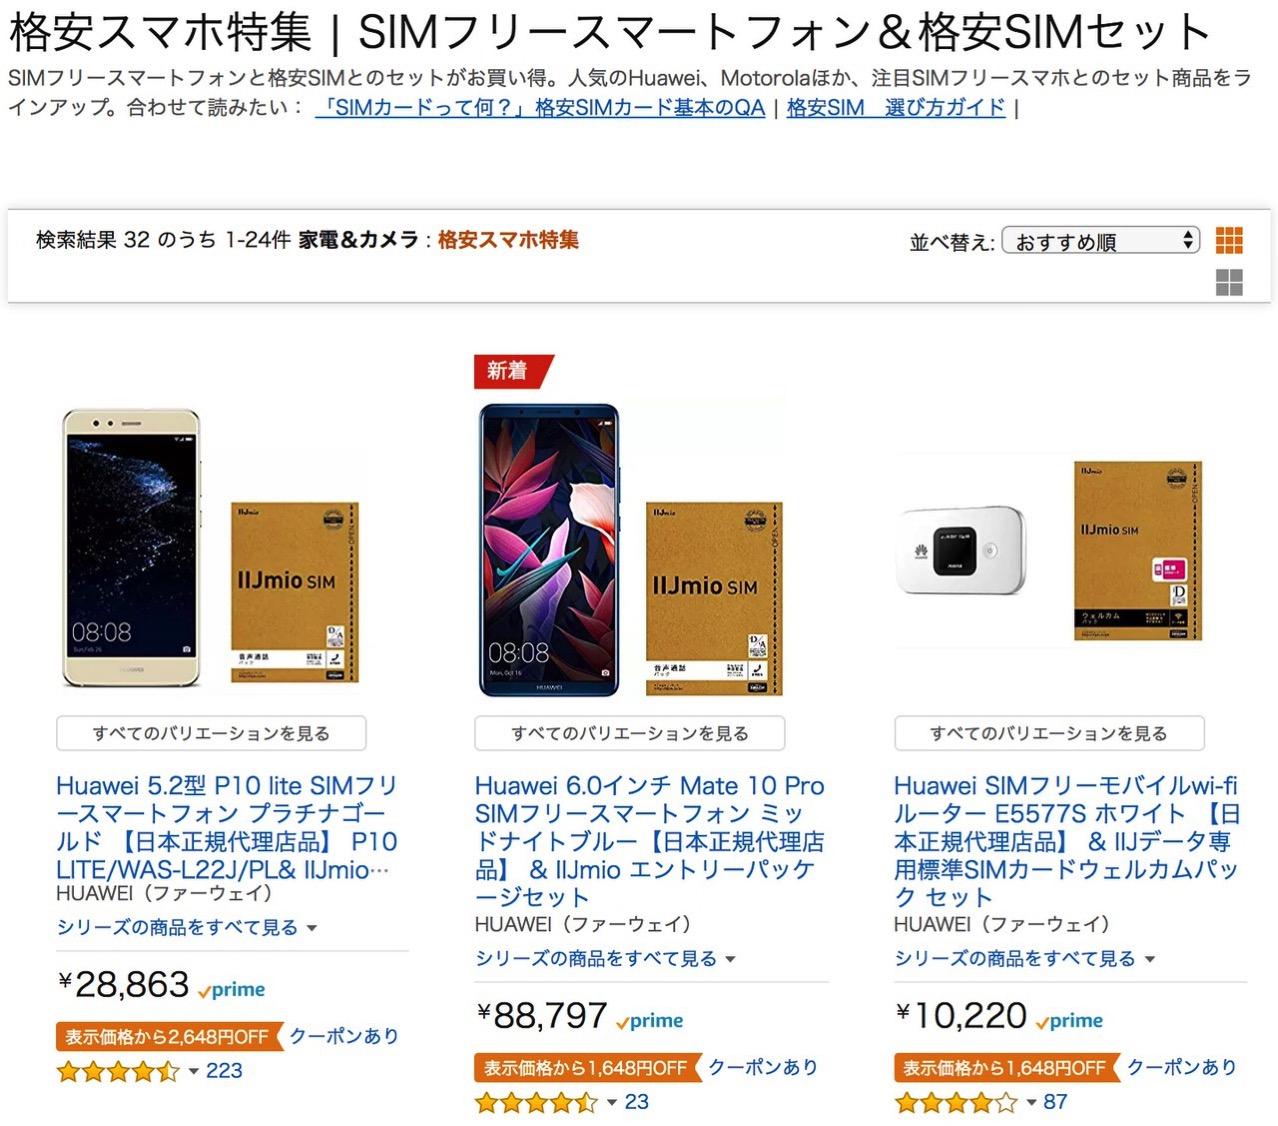 Amazon、最大2,900円オフになるSIMフリースマートフォン&格安SIMセット